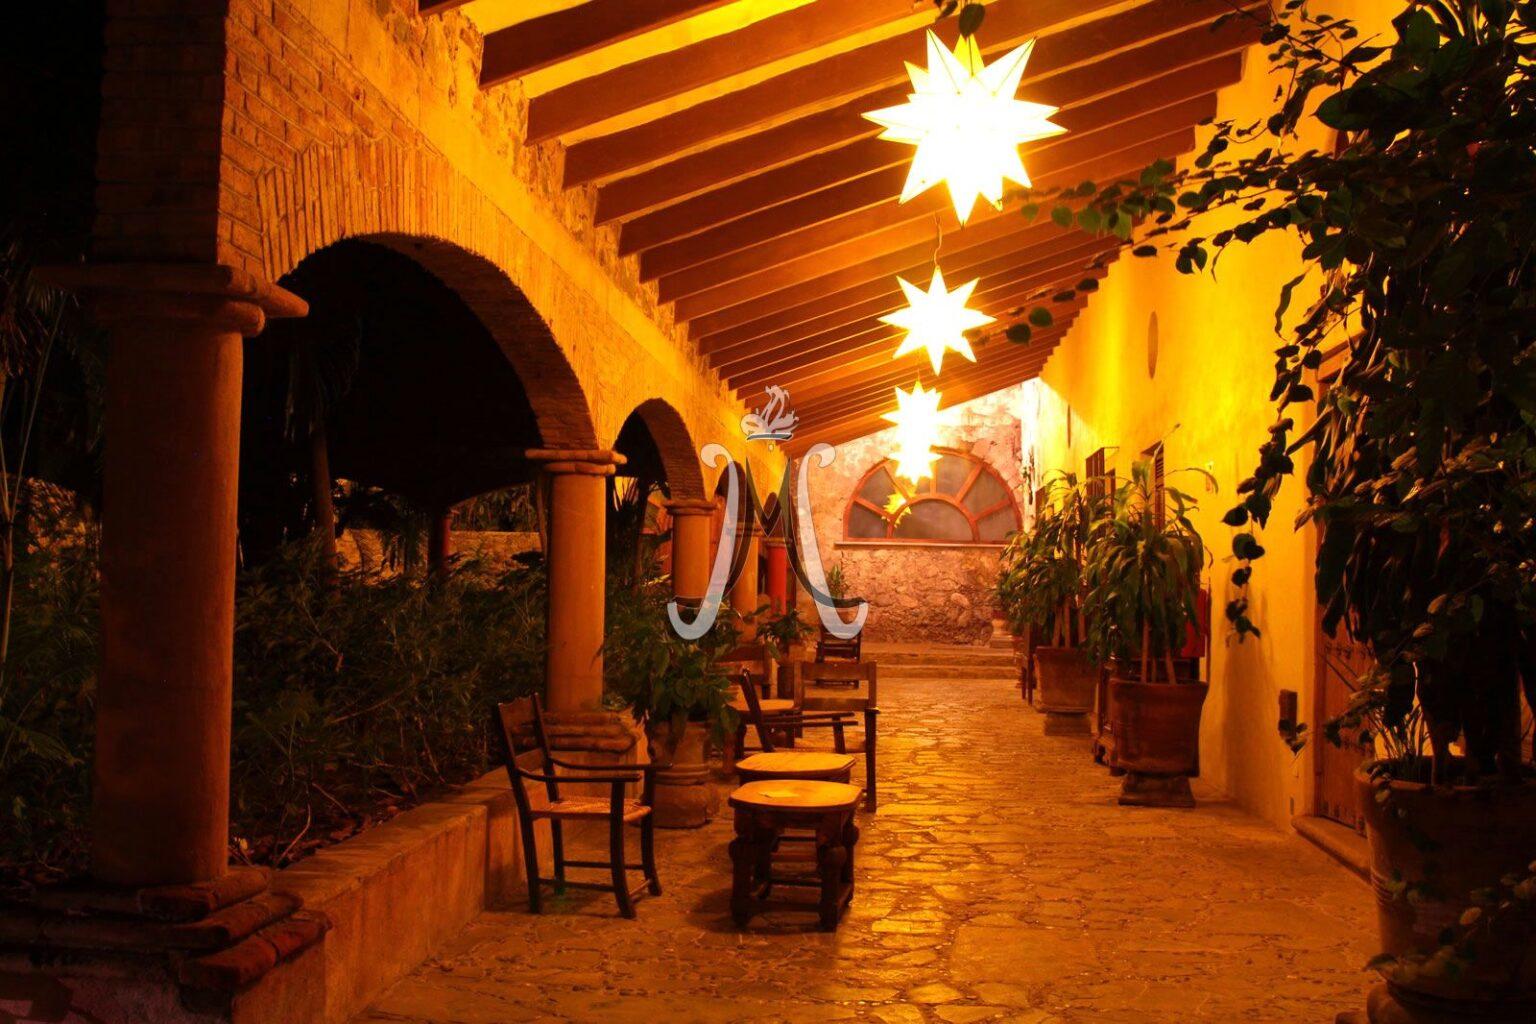 hacienda_san_gabriel_noche13